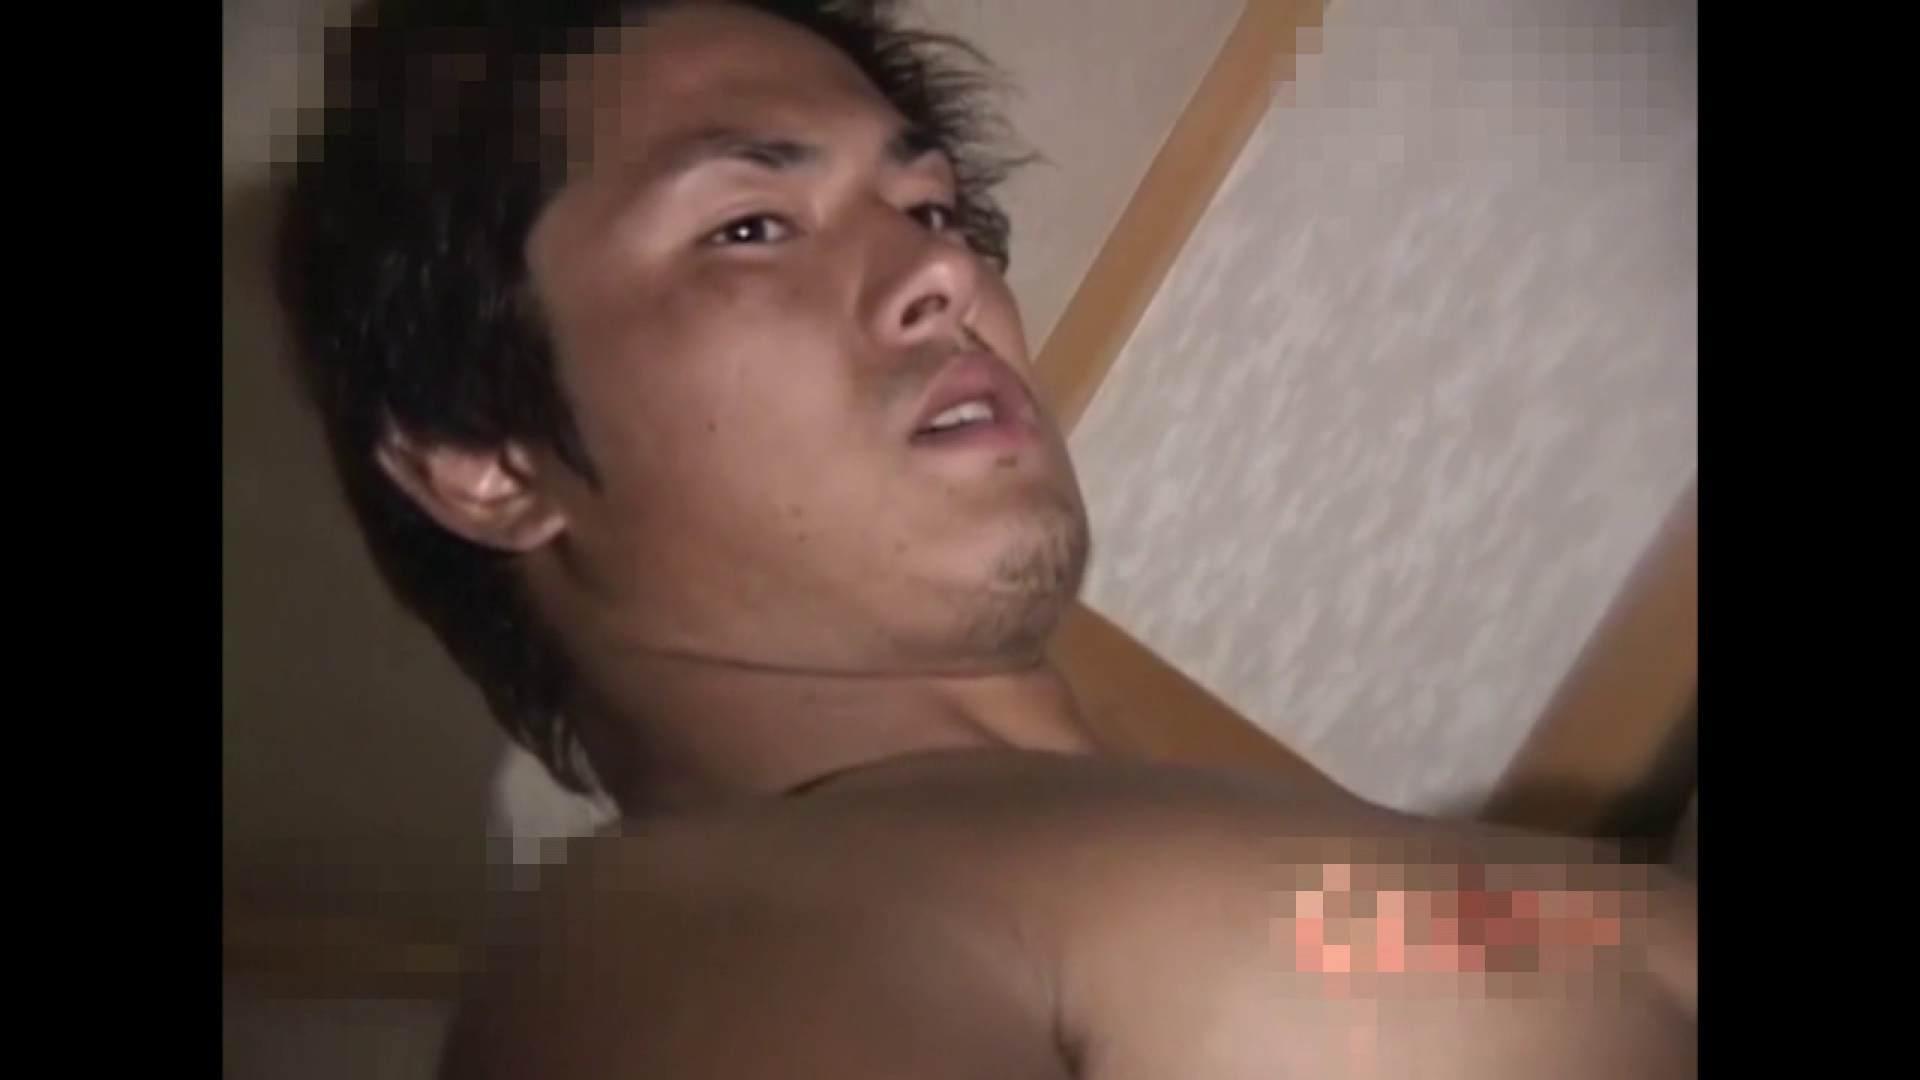 Beautiful muscle モッコリ野郎達!Vol.10 念願の完全無修正 ゲイ丸見え画像 39連発 24